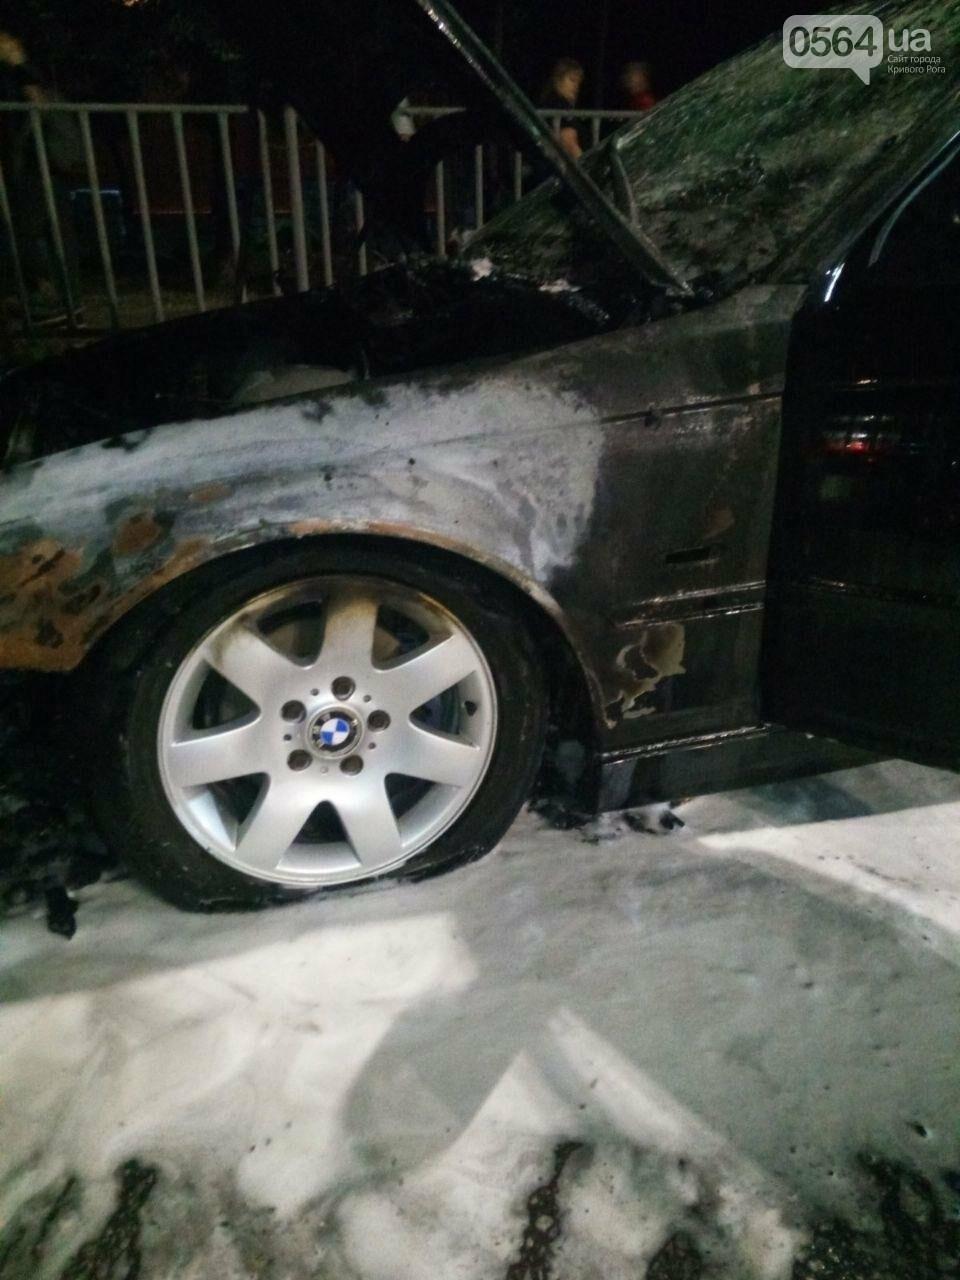 В Кривом Роге на ходу загорелась иномарка, - ФОТО, фото-2